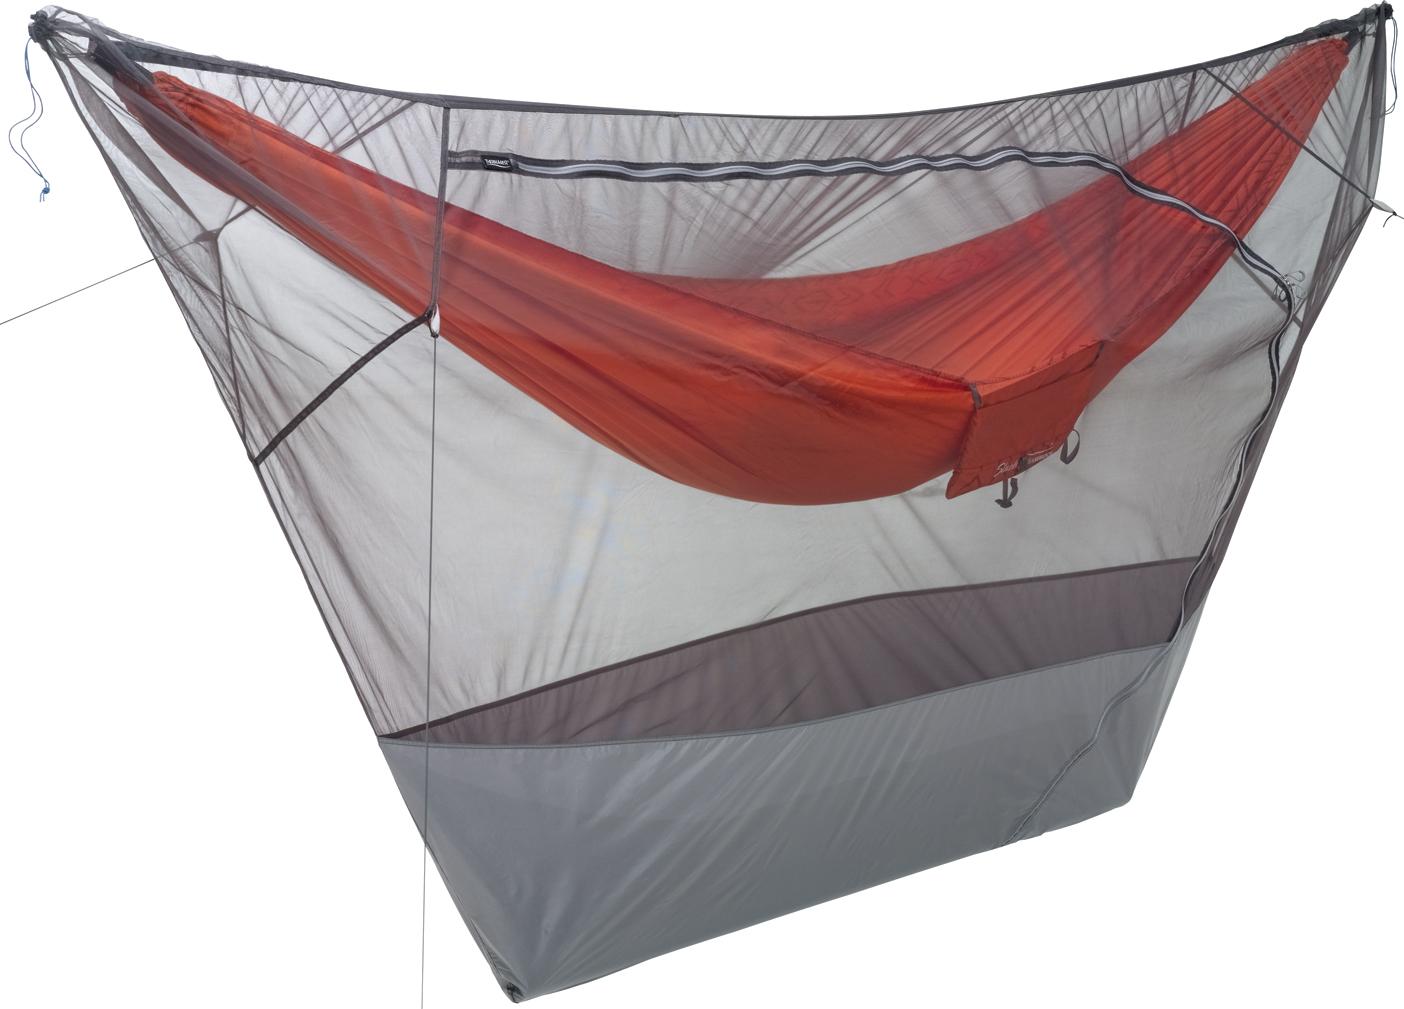 single img classic product camping and mosquito fly hammock rain tarp net serac hammocks with dartfrog bug